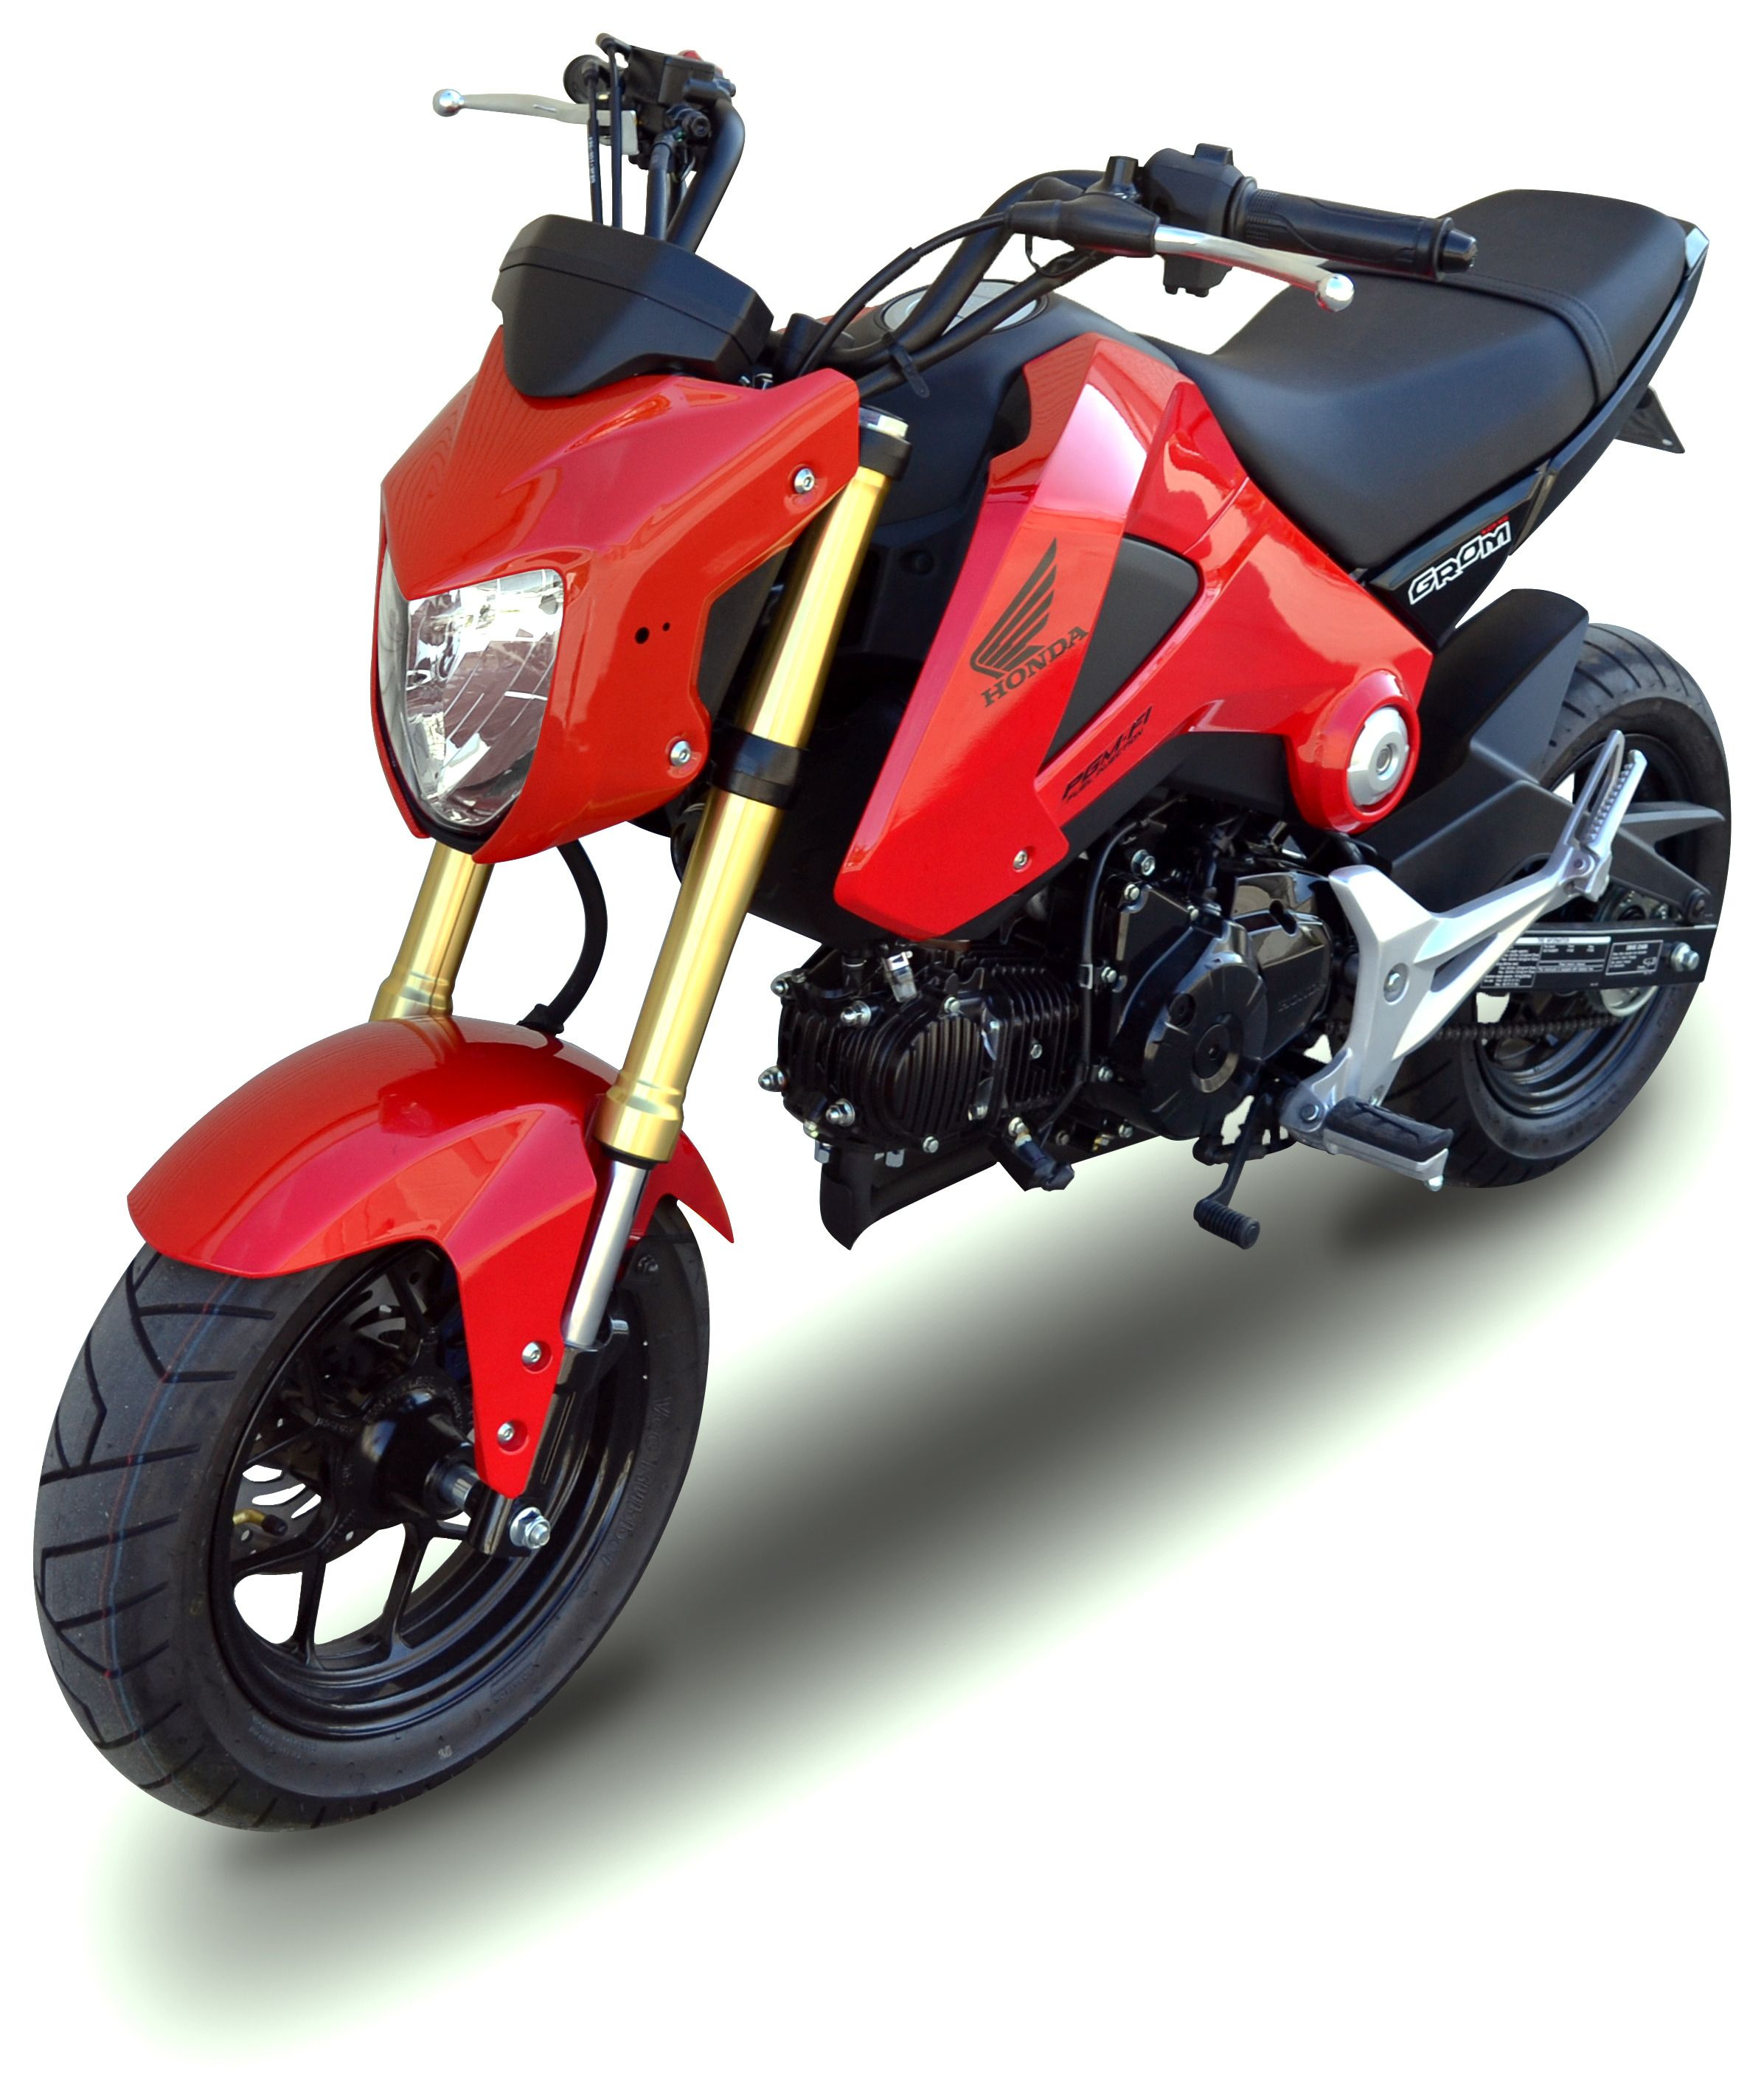 2015 Honda Grom >> Hotbodies Mask Front Fairing Honda Grom 2014 2015 20 29 99 Off Revzilla